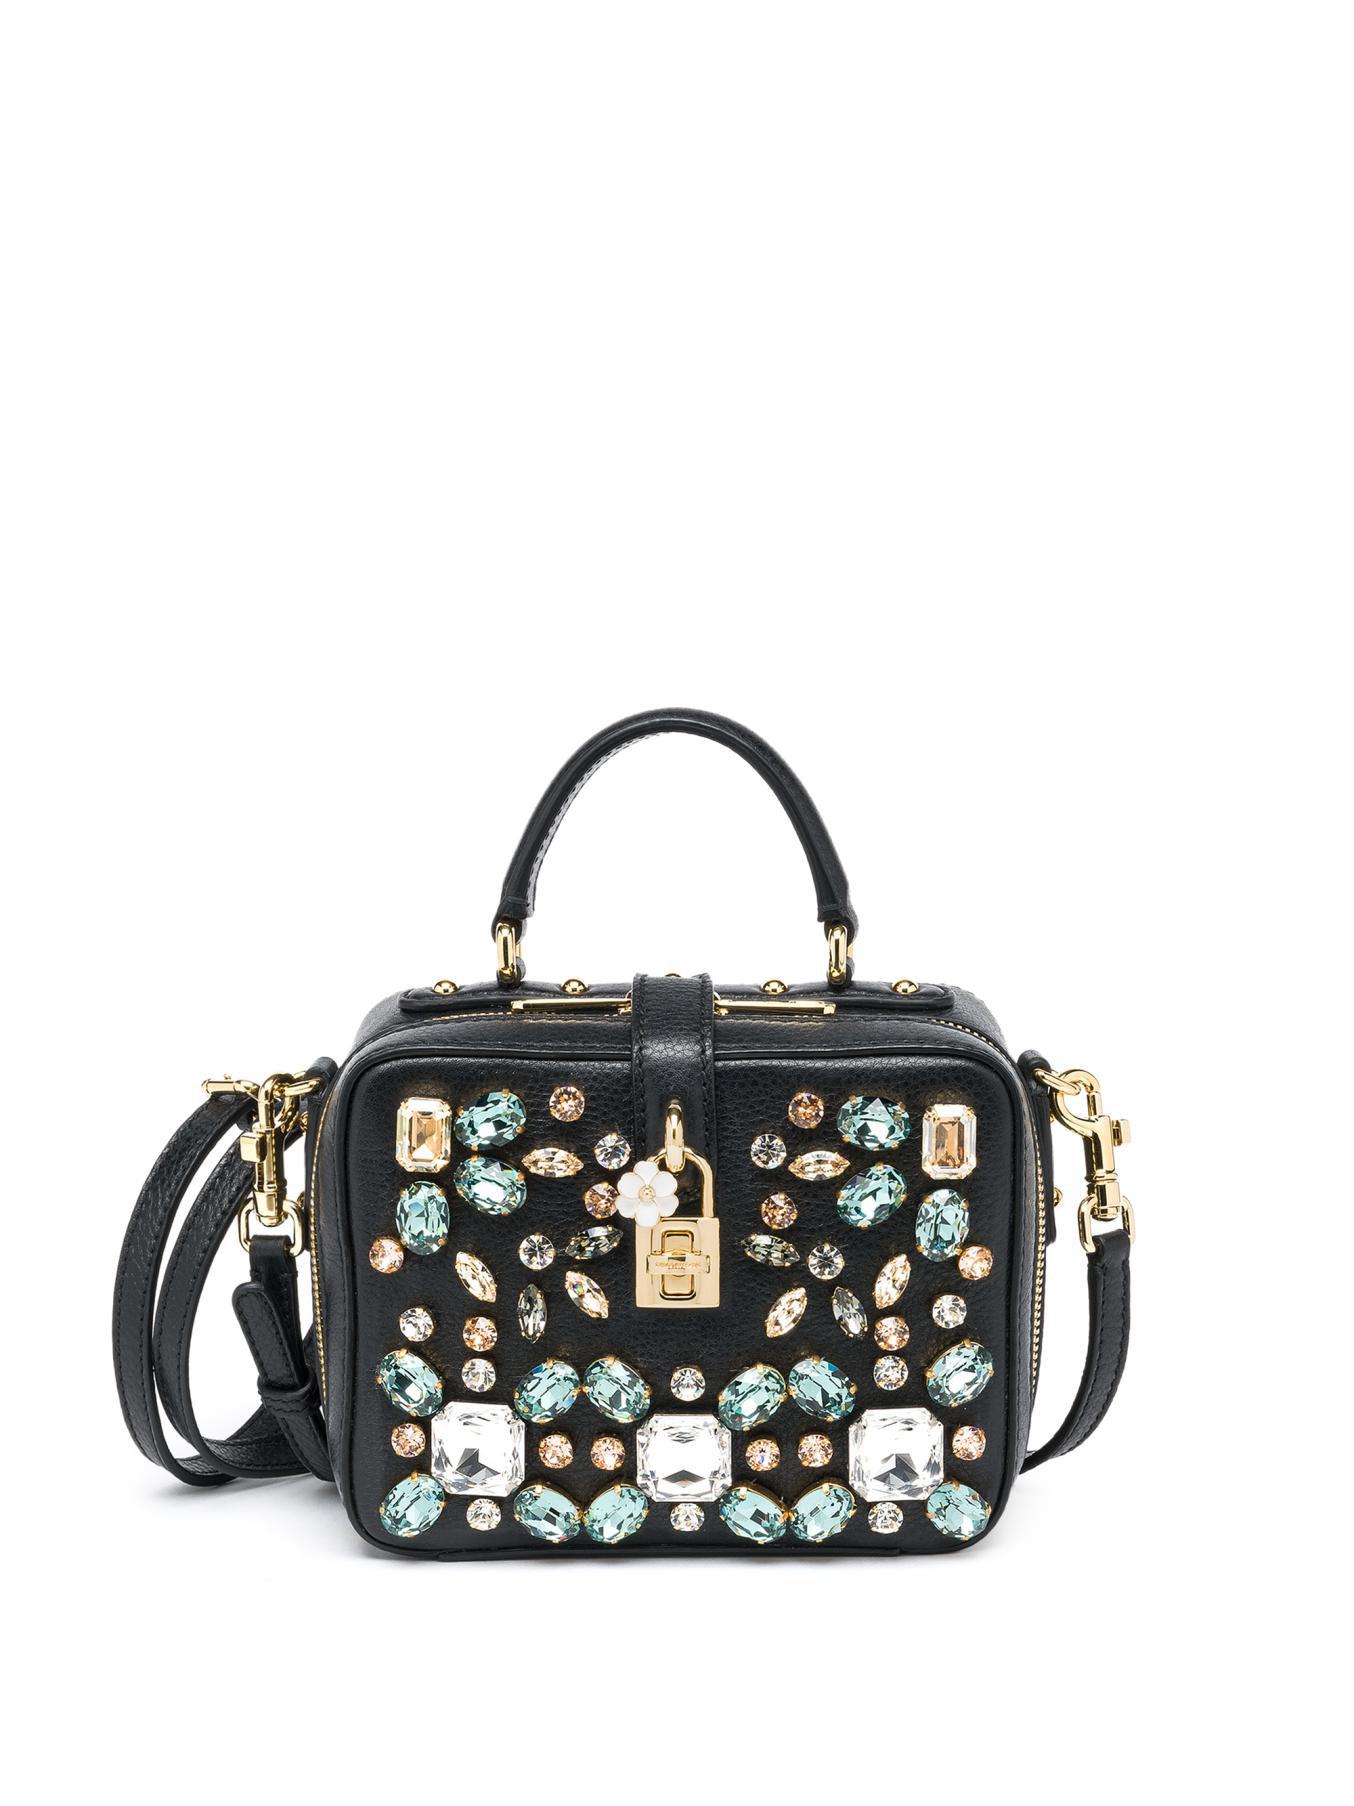 Lyst - Dolce   Gabbana Embellished Camera Bag in Black fd986d56ddd47